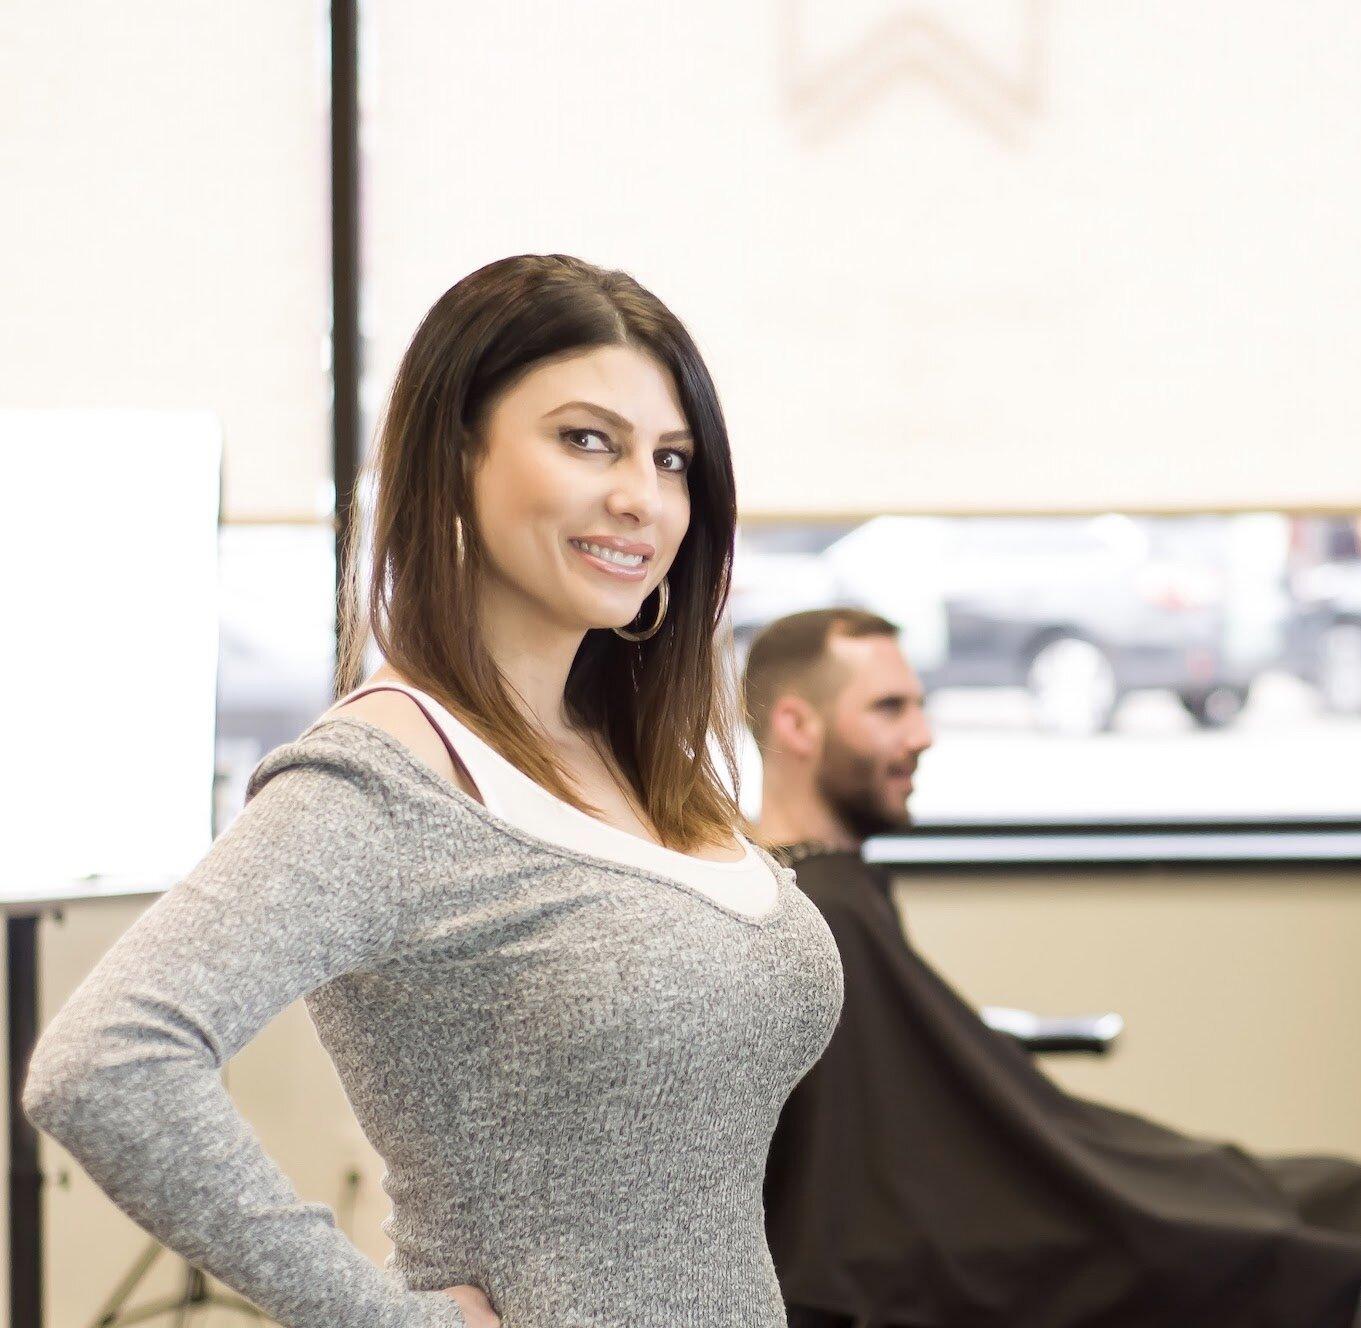 Men S Haircut Salon Barber Inspired W Barber Salon New Now Modern Mens Hair Salon Barber Inspired Welcome To Modern Men Haircut S Men S Haircuts Place Near Me Men S